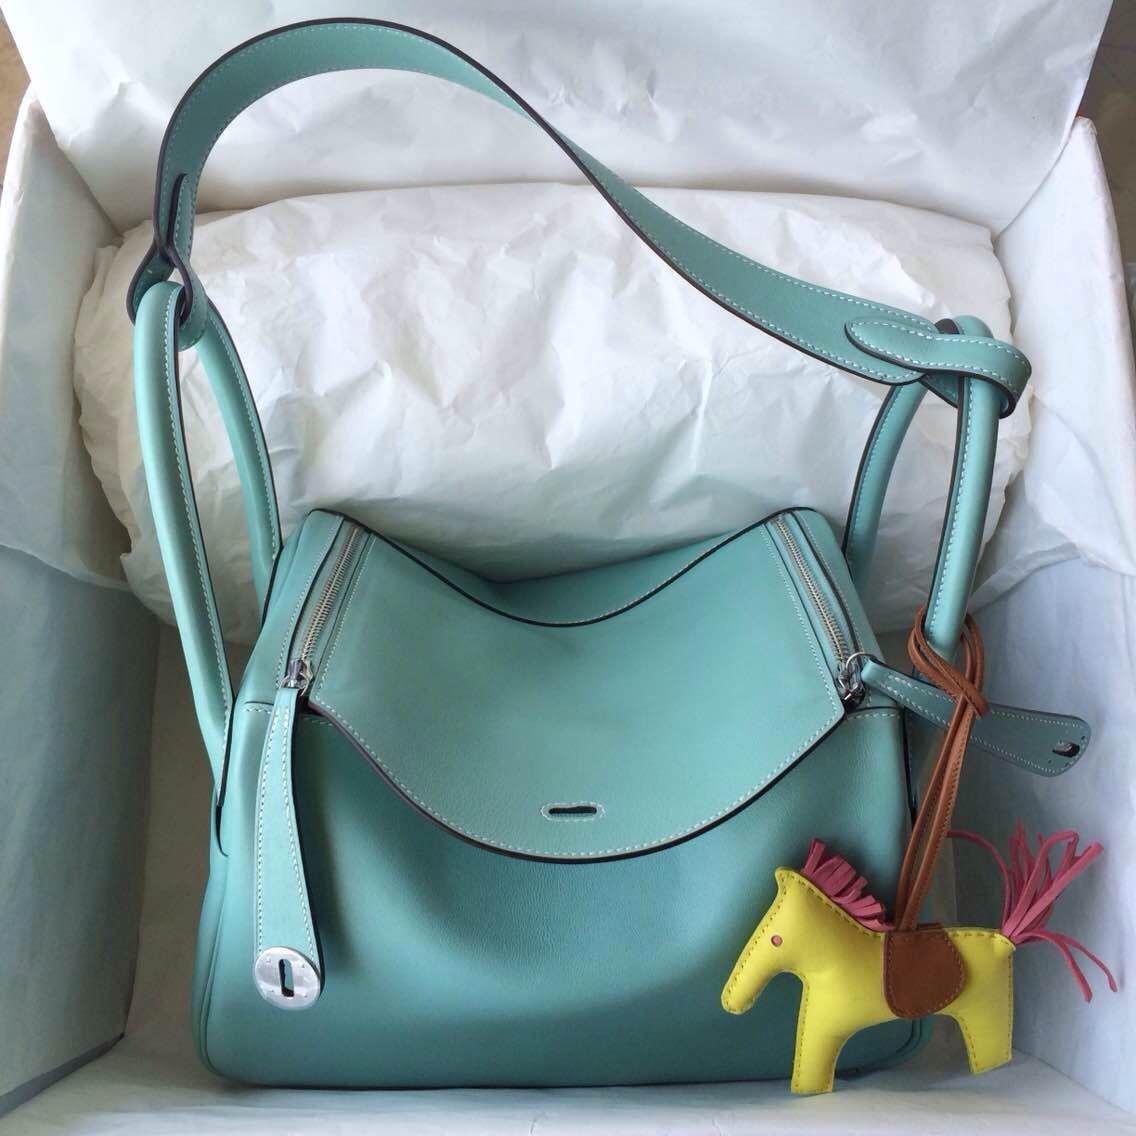 c4c1bdf16d13 New Color 3P Lagon Blue Swift Leather Hermes Lindy Bag 30cm Silver Hardware  — Hermes Crocodile Birkin Bag